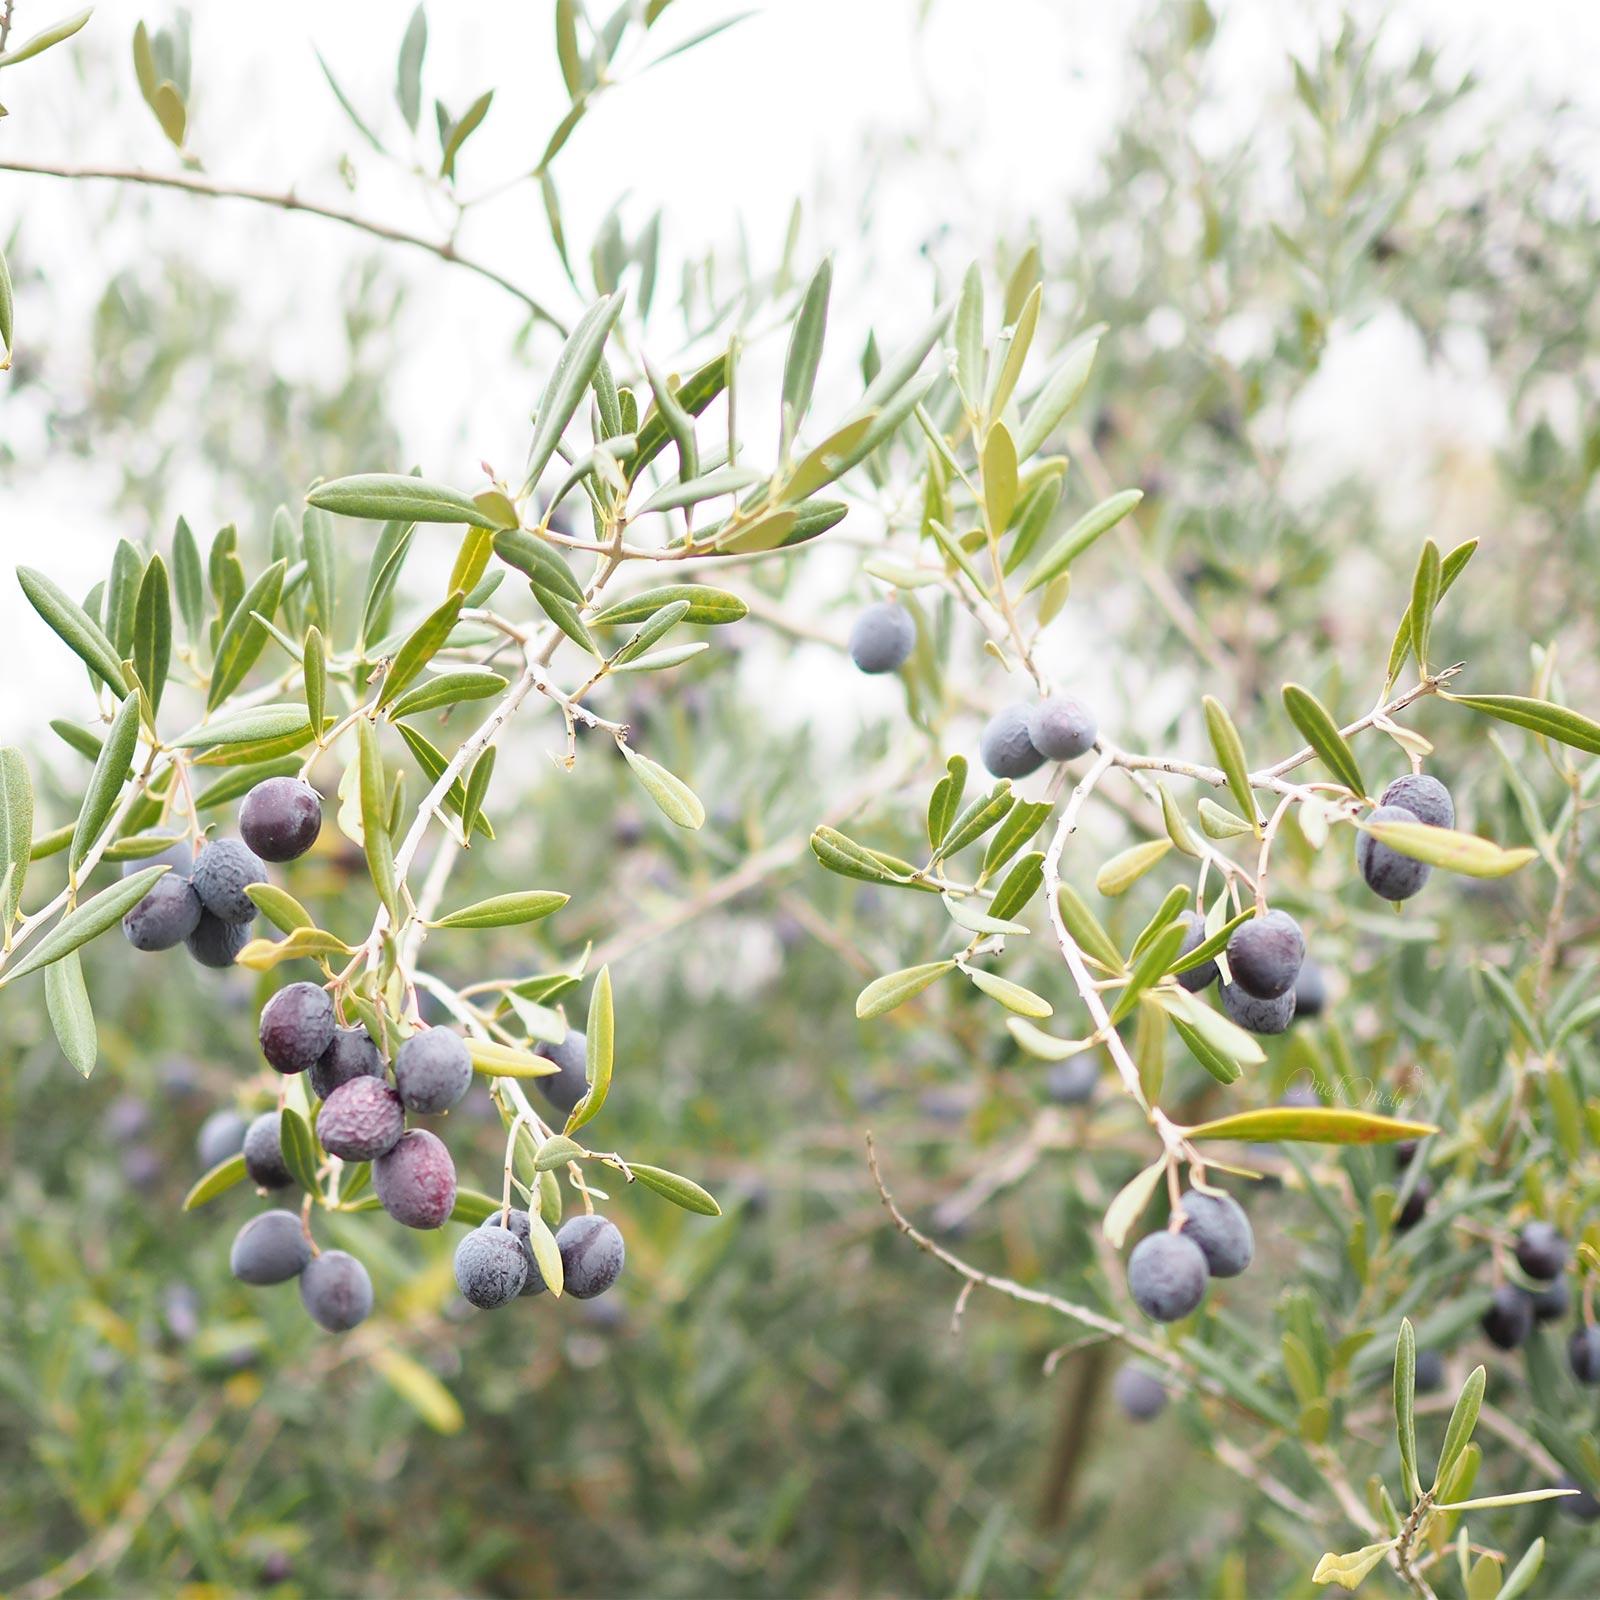 cueillette-olives-jardin-bamba-decembre-aceitunas-invierno